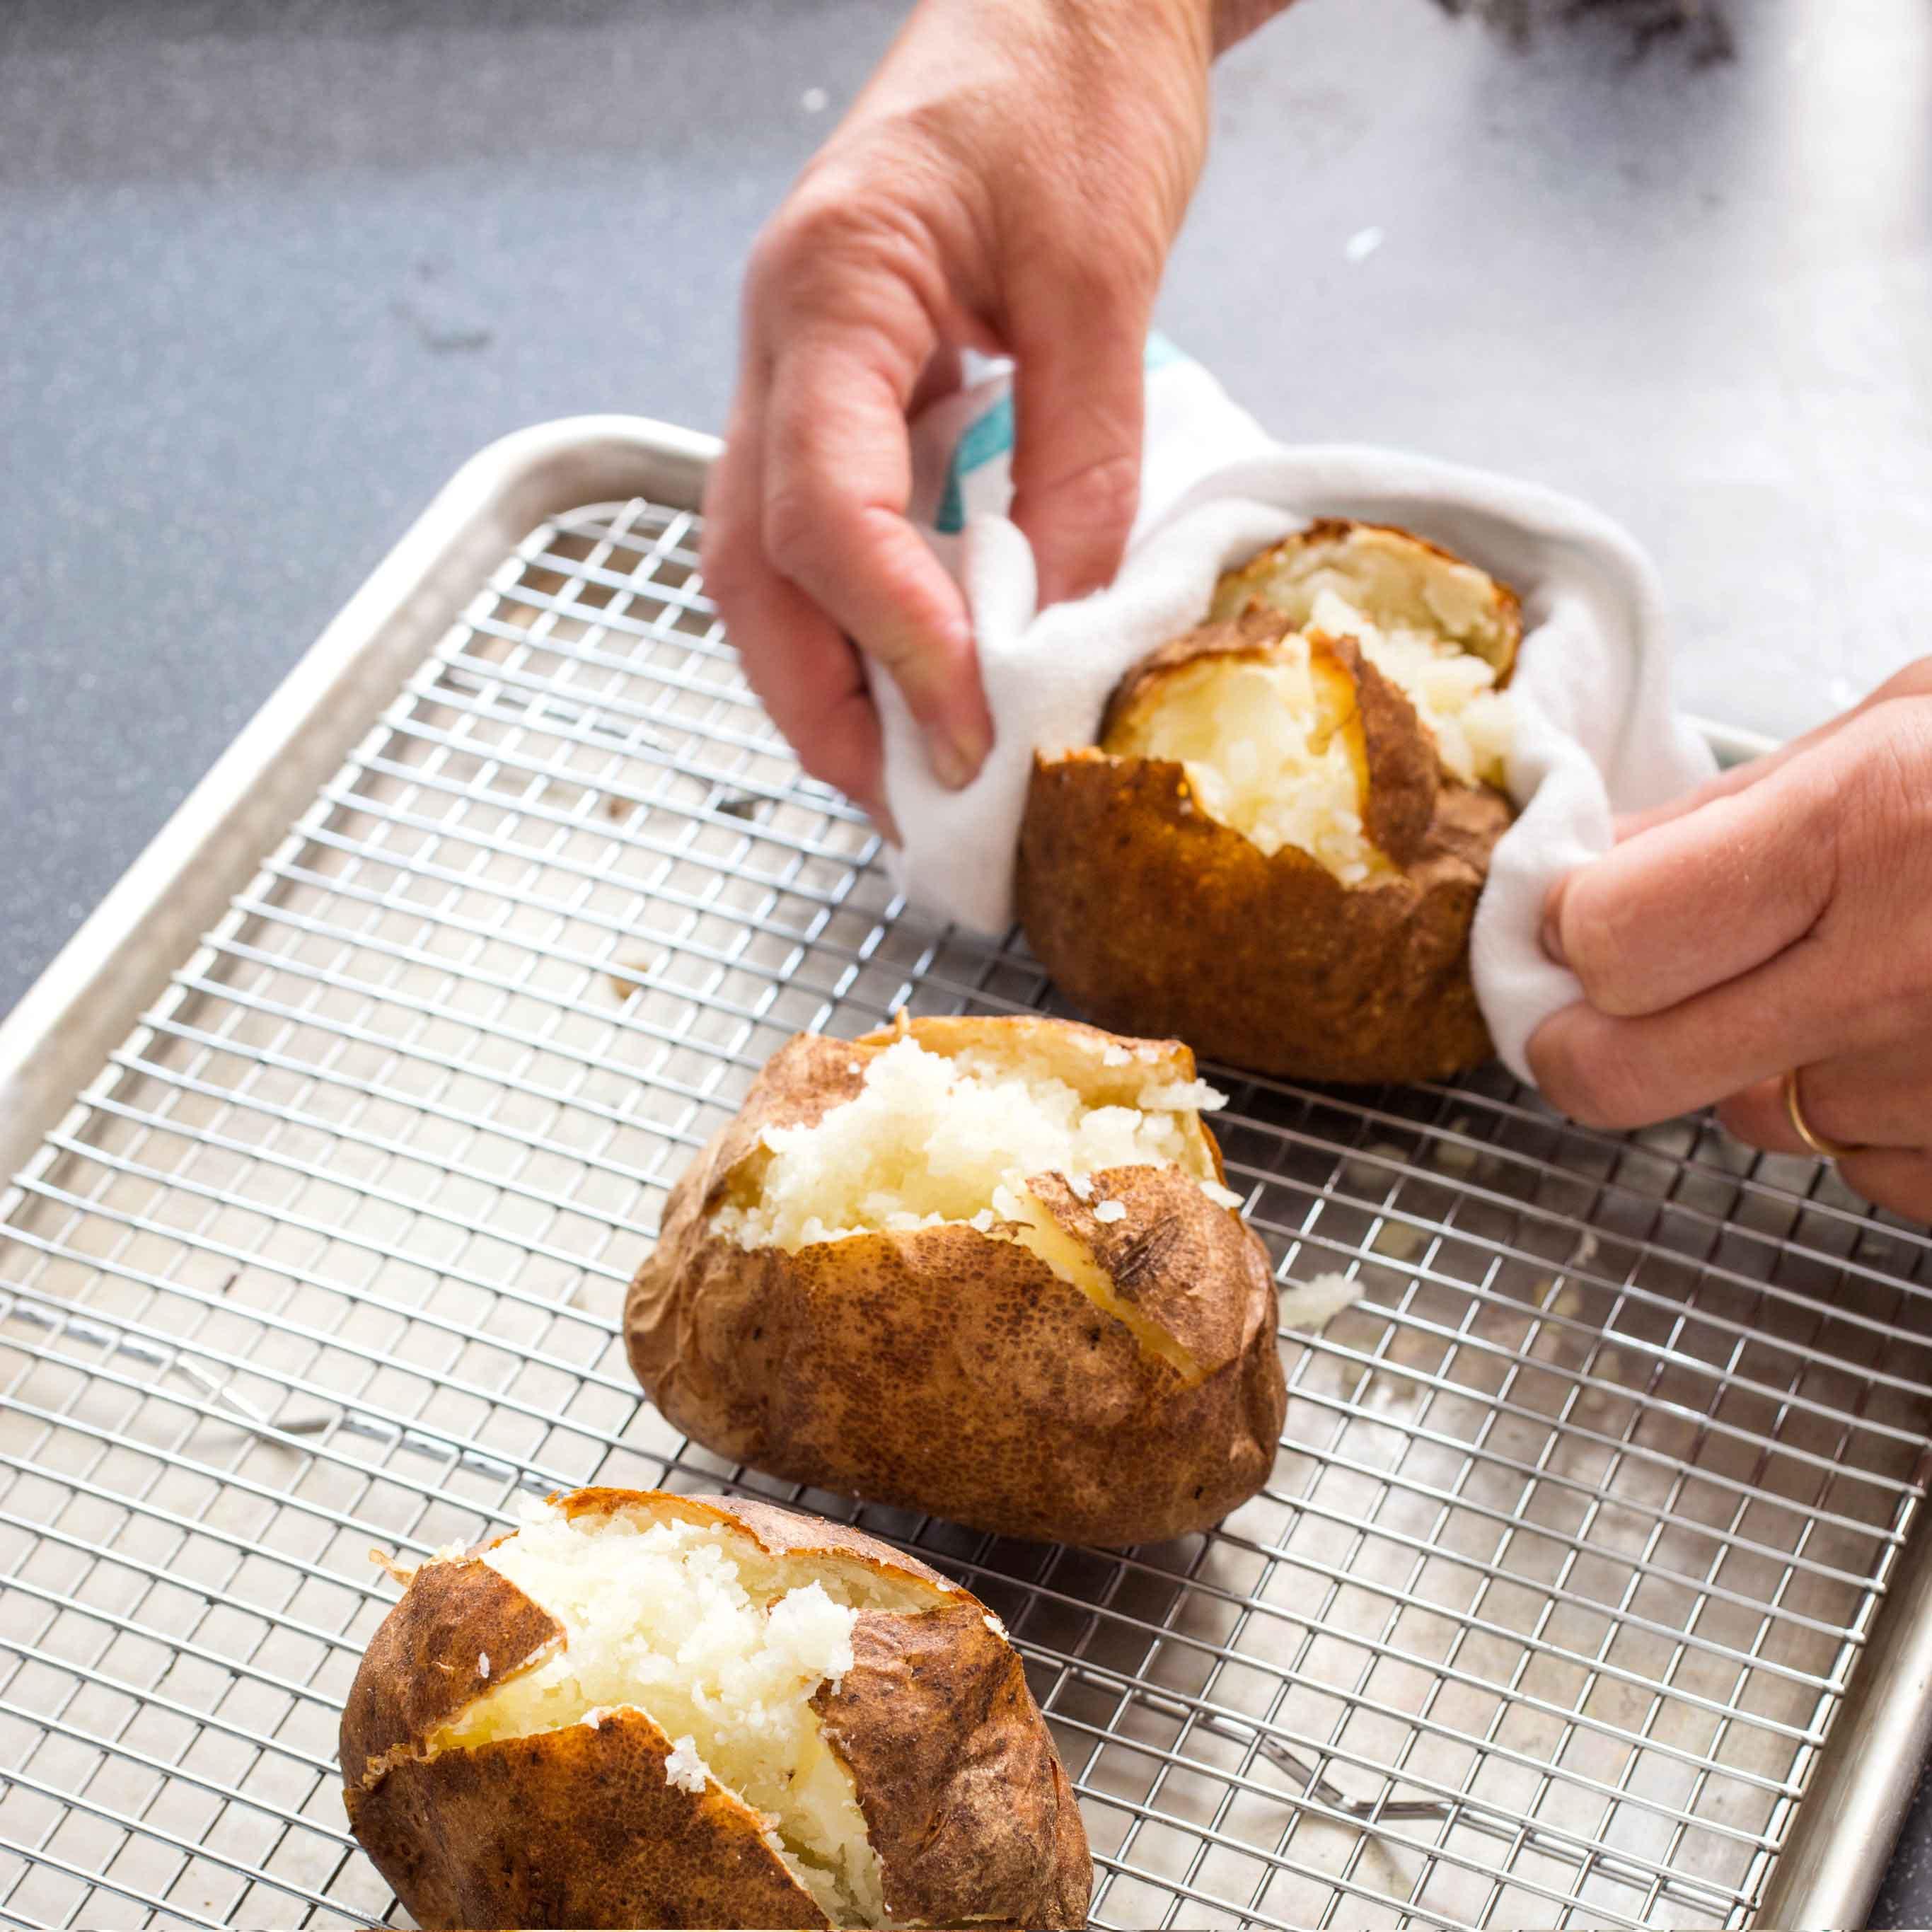 Best Baked Potatoes